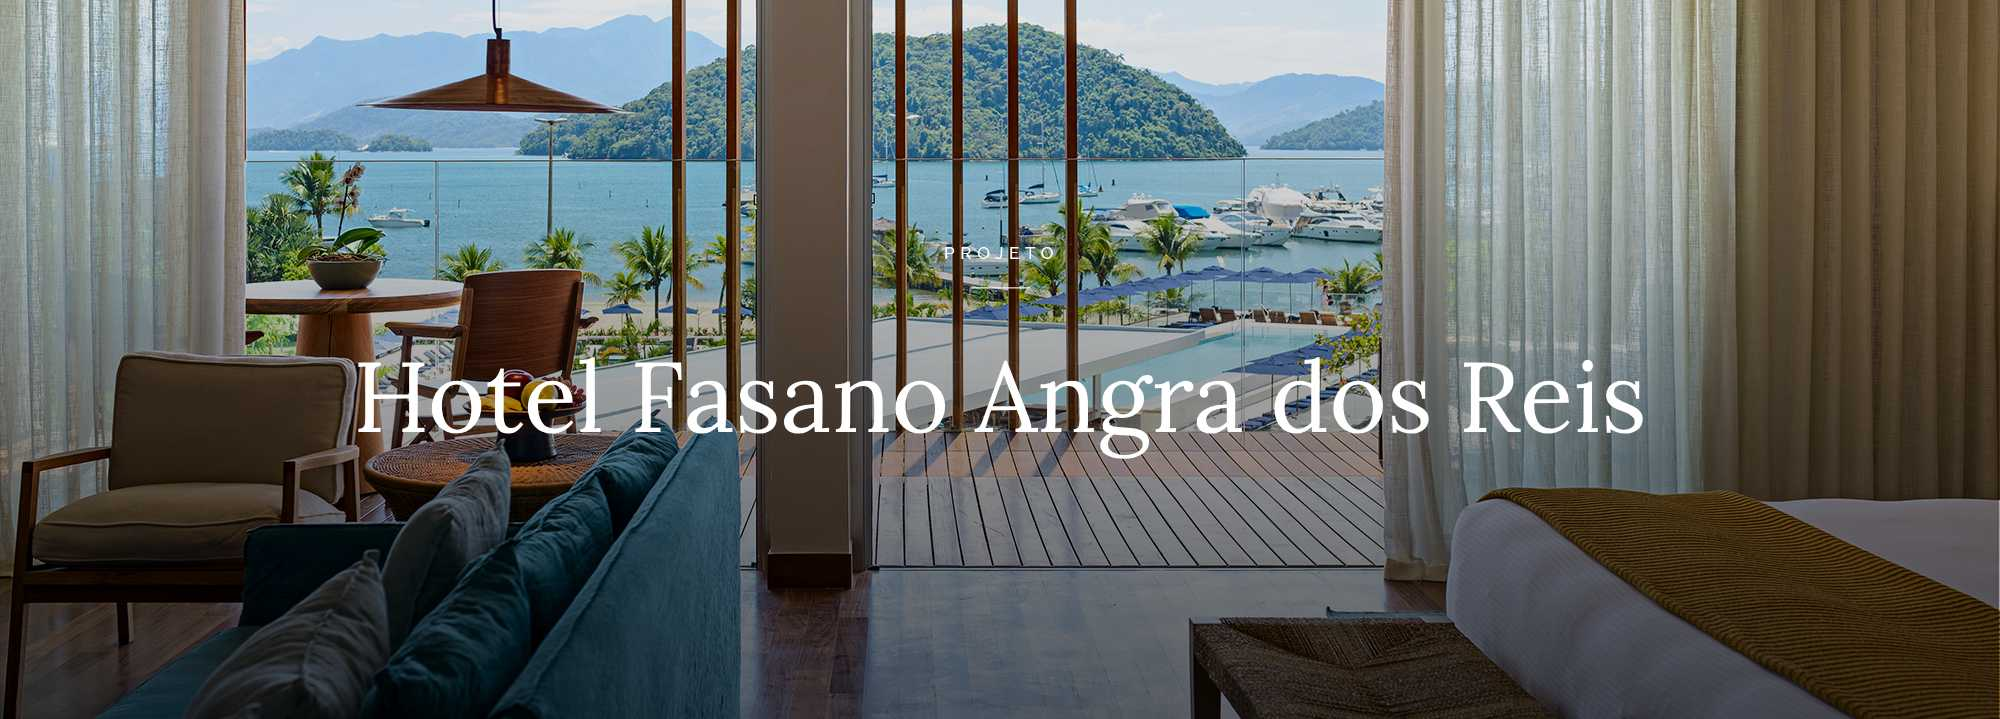 HotelFasanoAngra